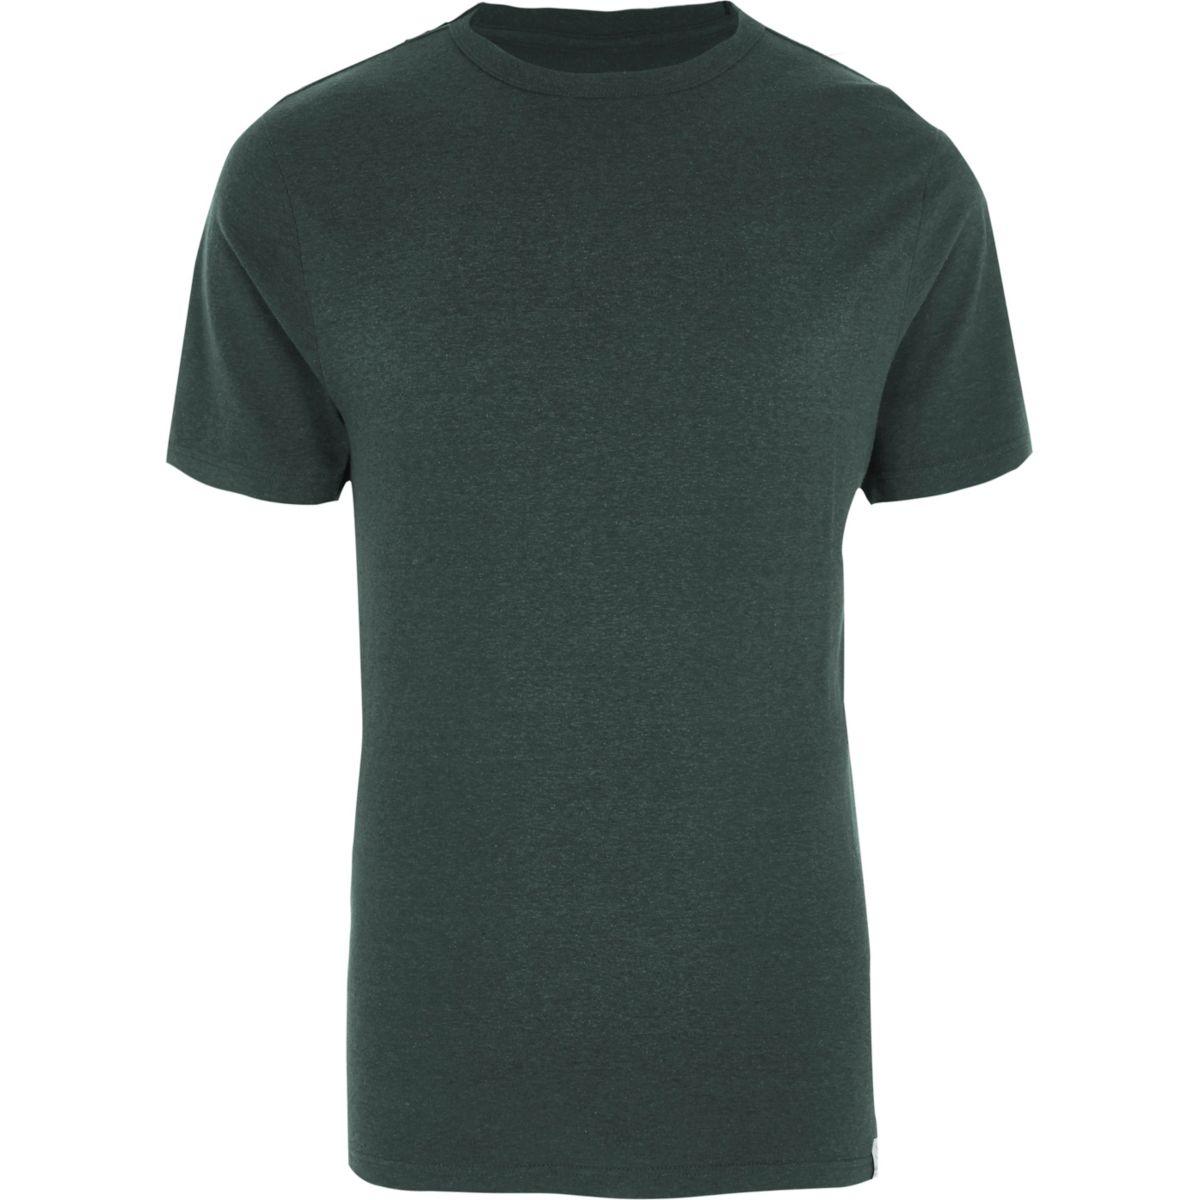 Dark green slim fit crew neck T-shirt